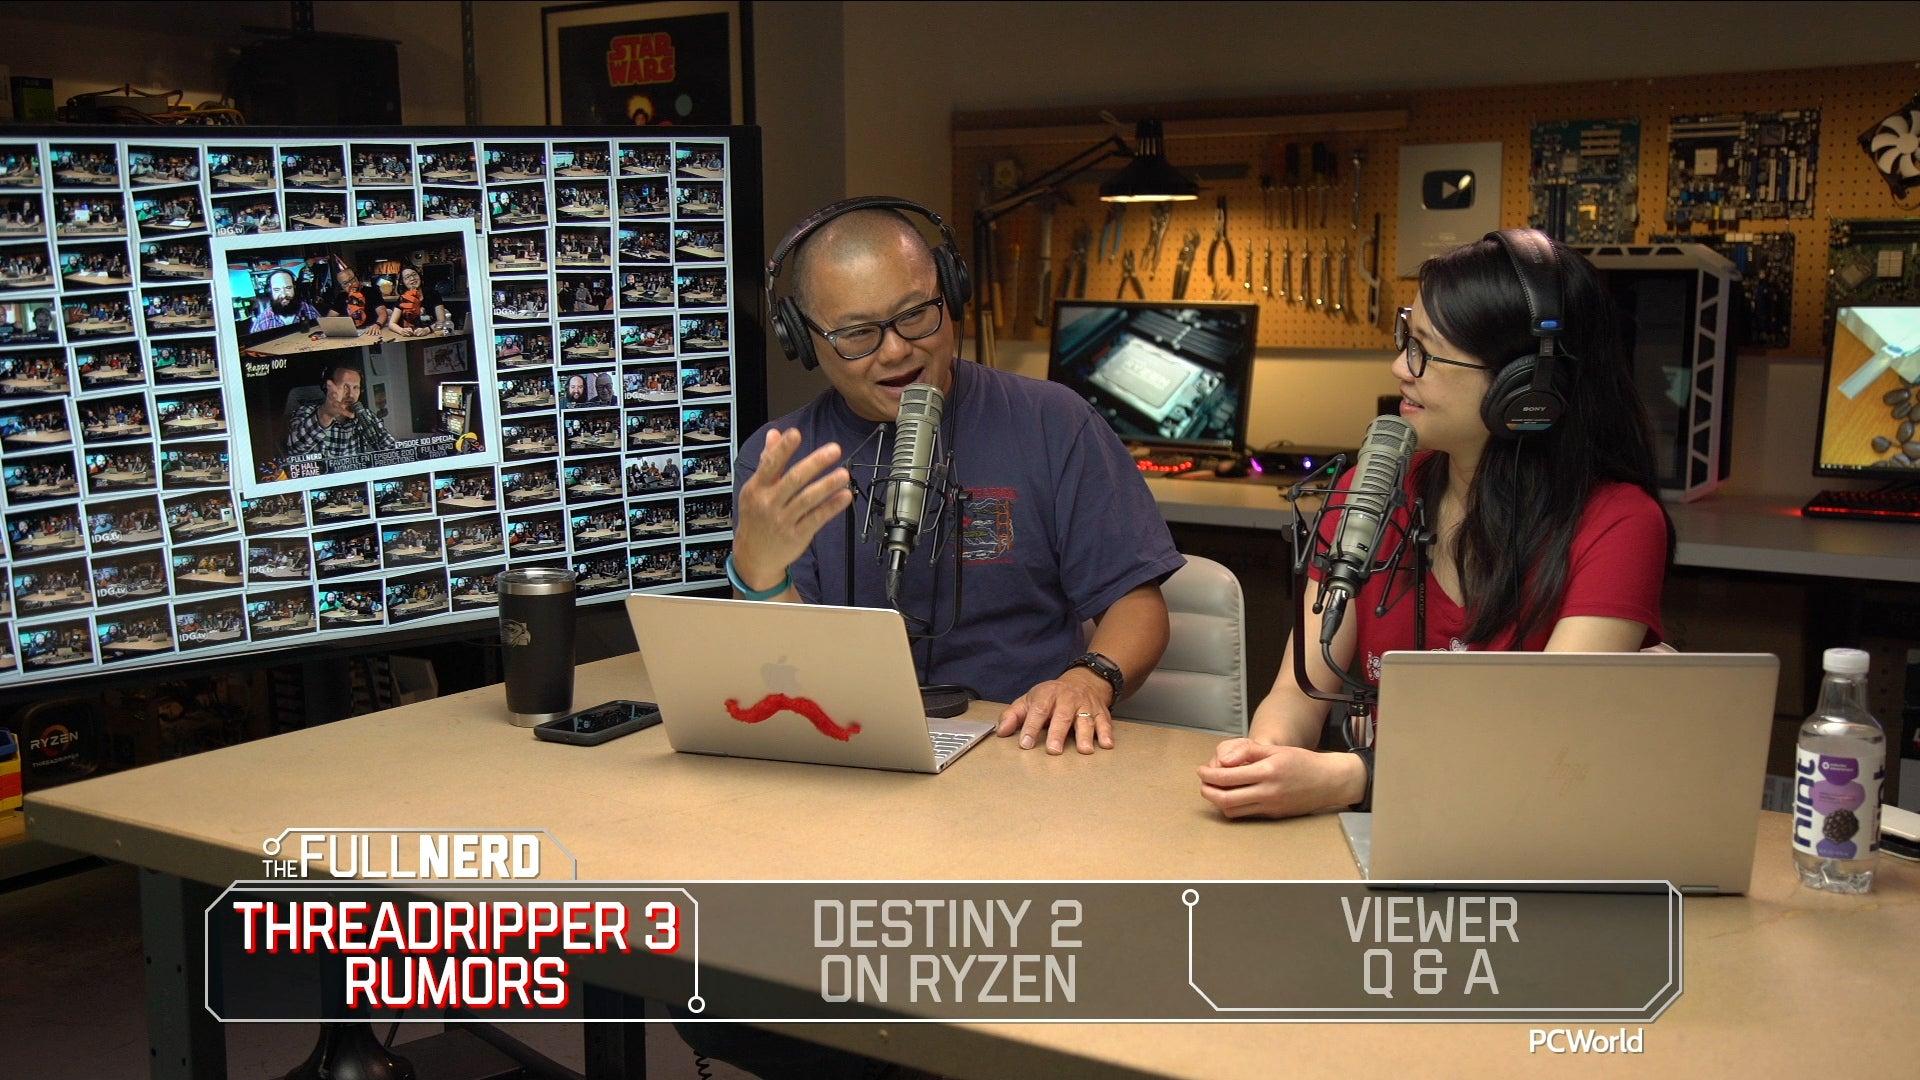 Threadripper 3 rumors, Destiny 2 on Ryzen, Q&A | The Full